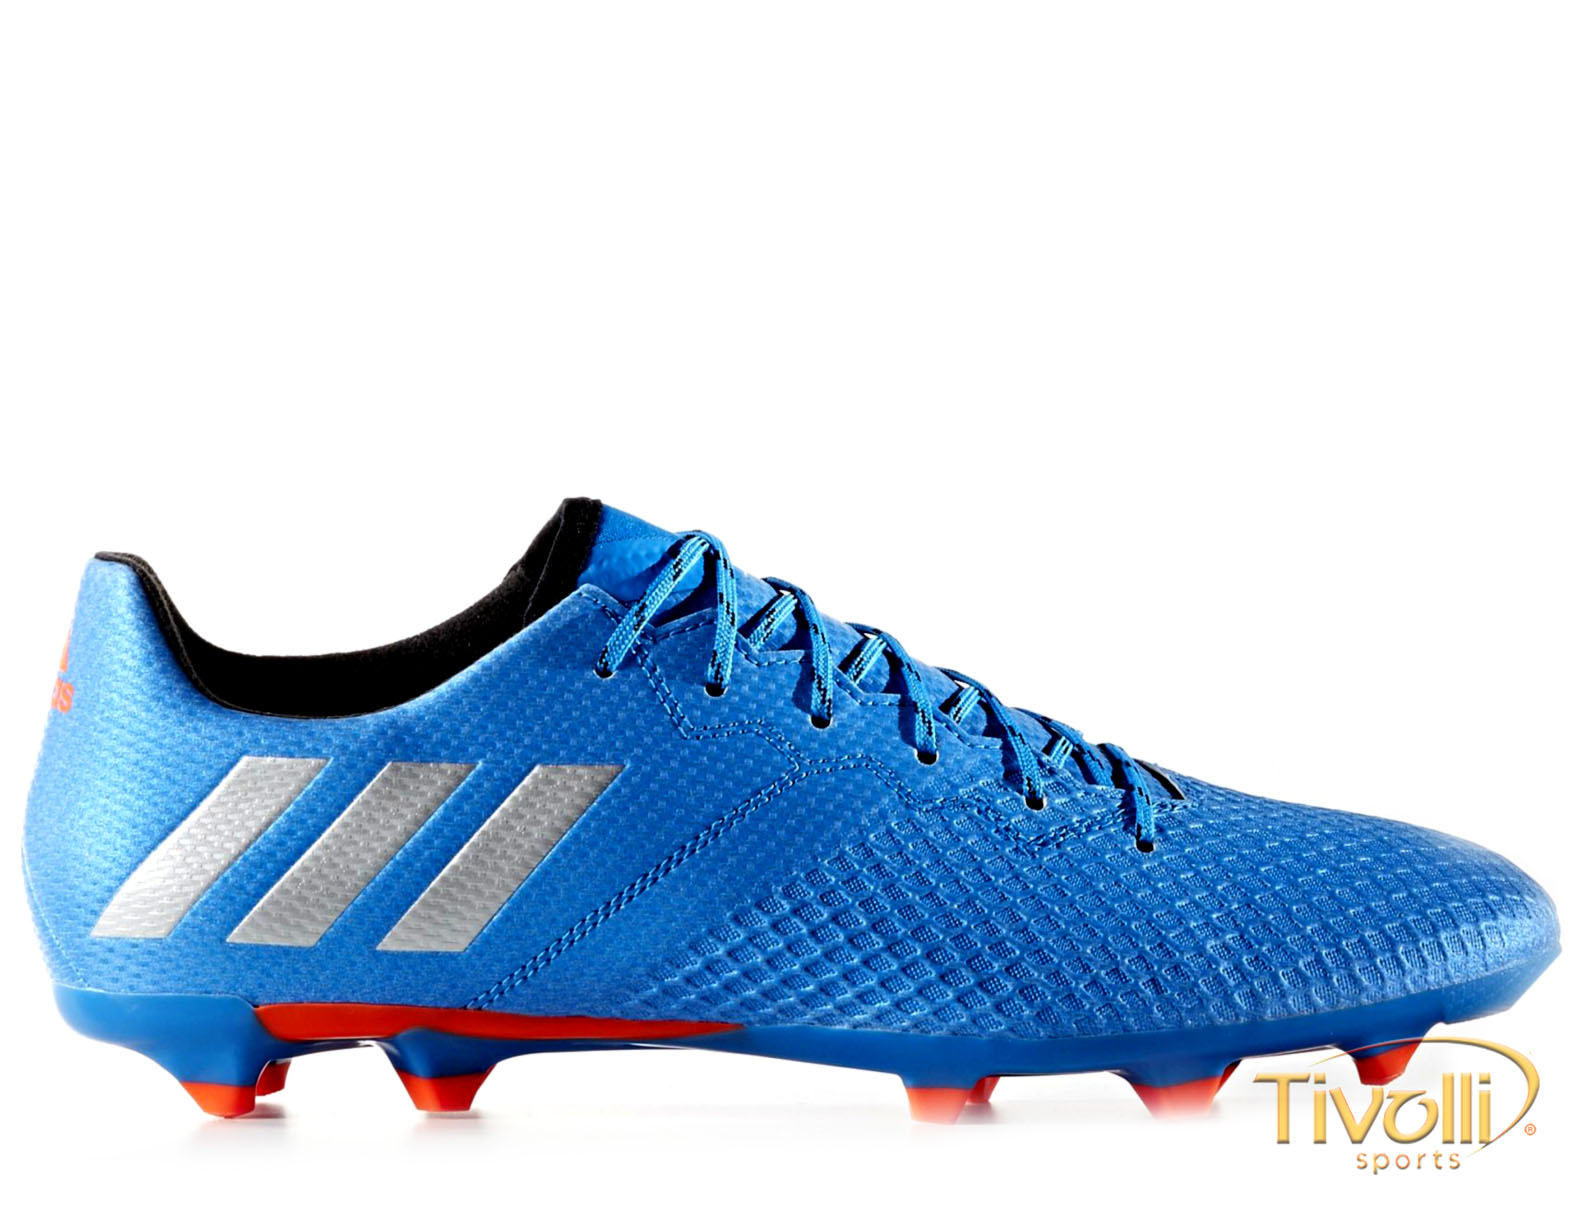 aef0223ef5ceb Chuteira Adidas Messi 16.3 Firm Ground Cleats FG Campo